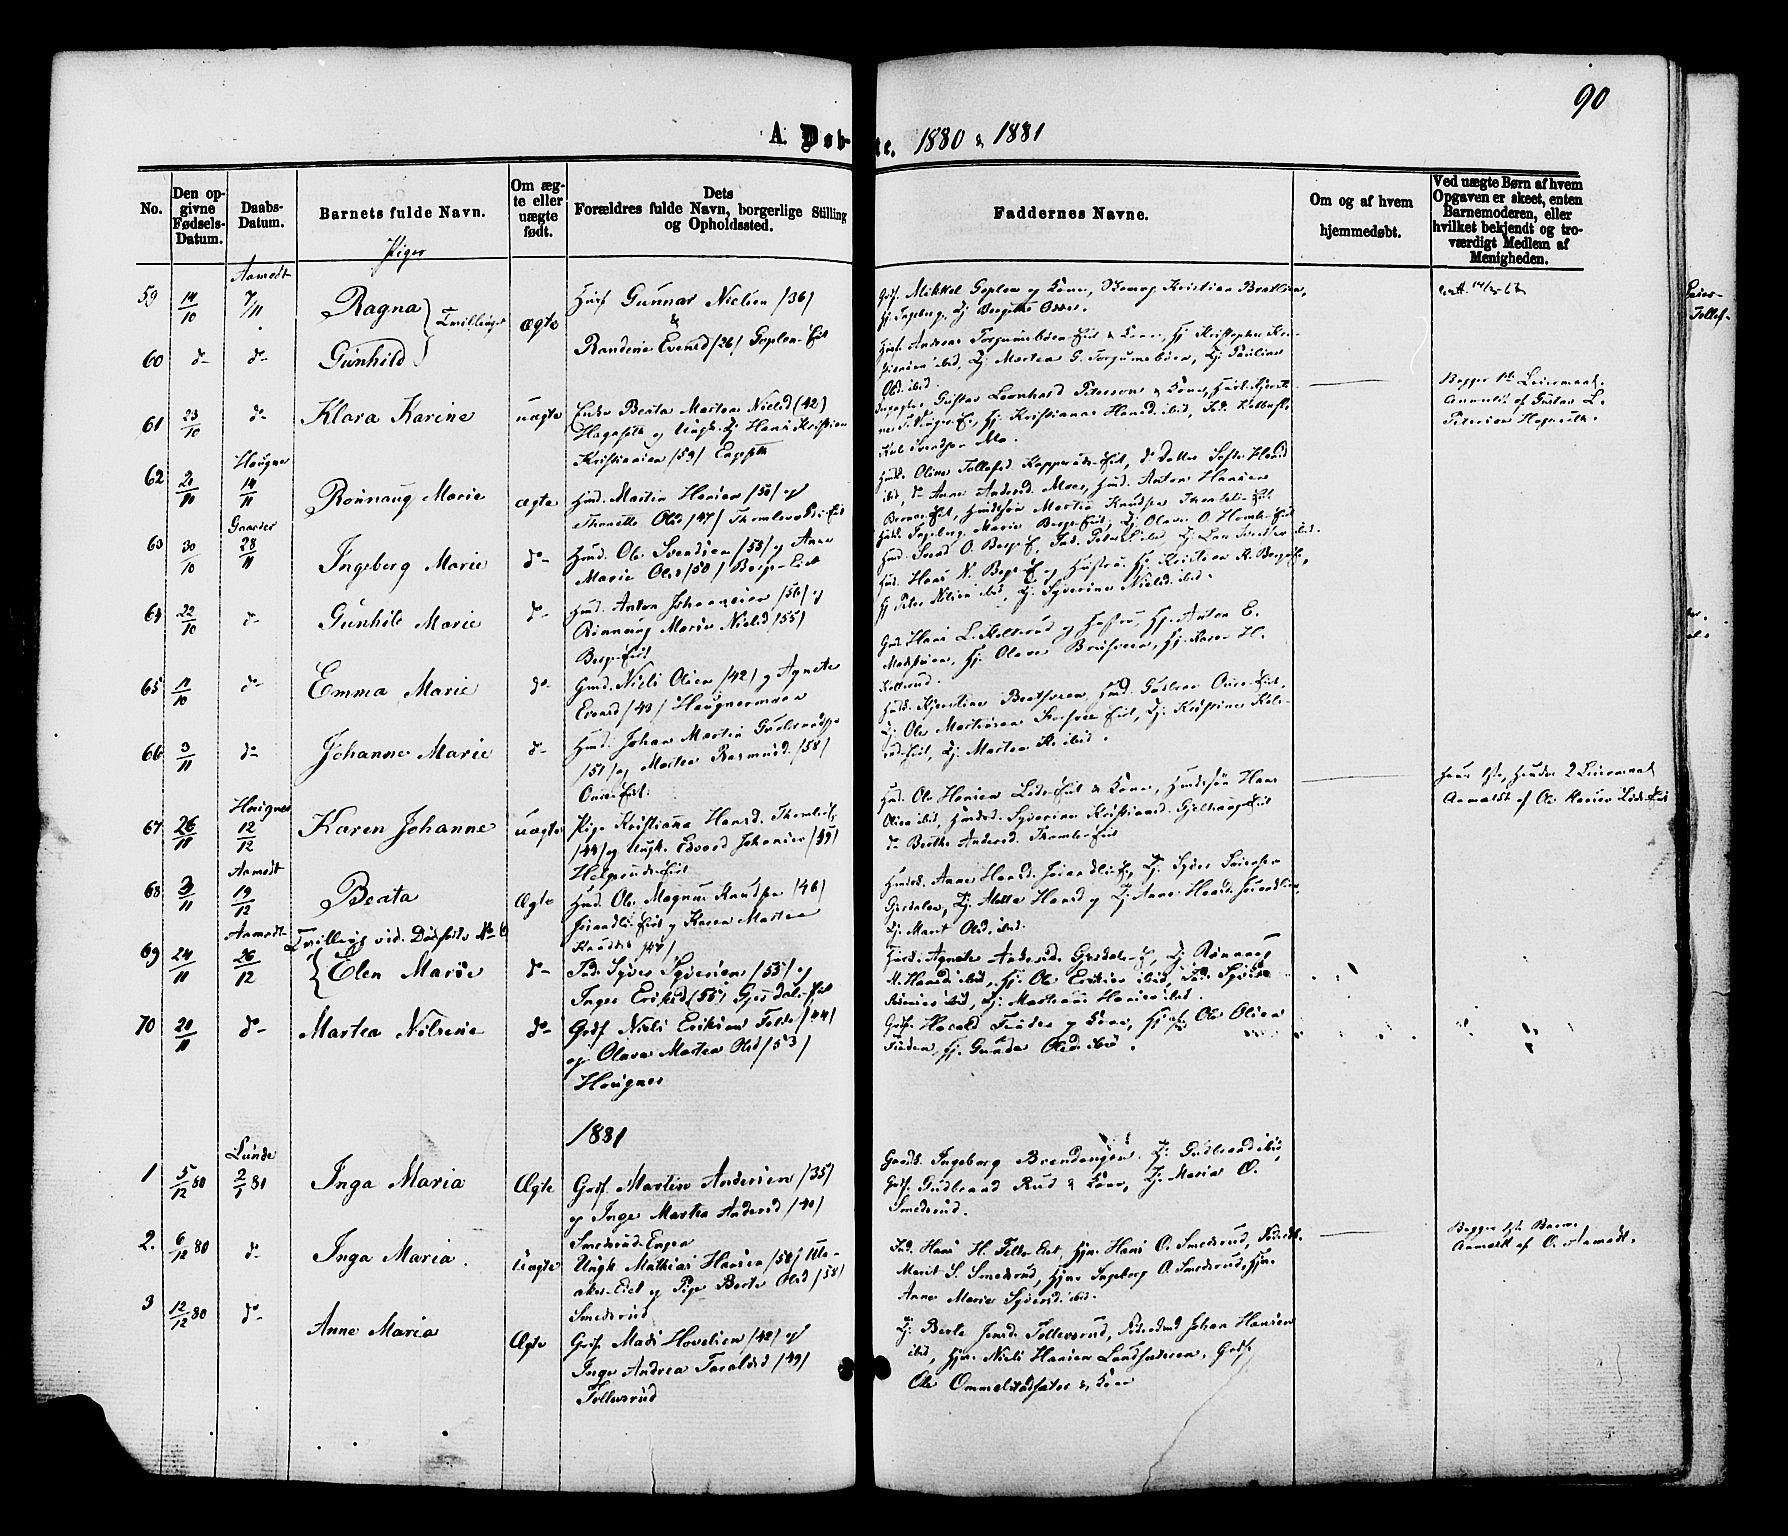 SAH, Nordre Land prestekontor, Ministerialbok nr. 2, 1872-1881, s. 90